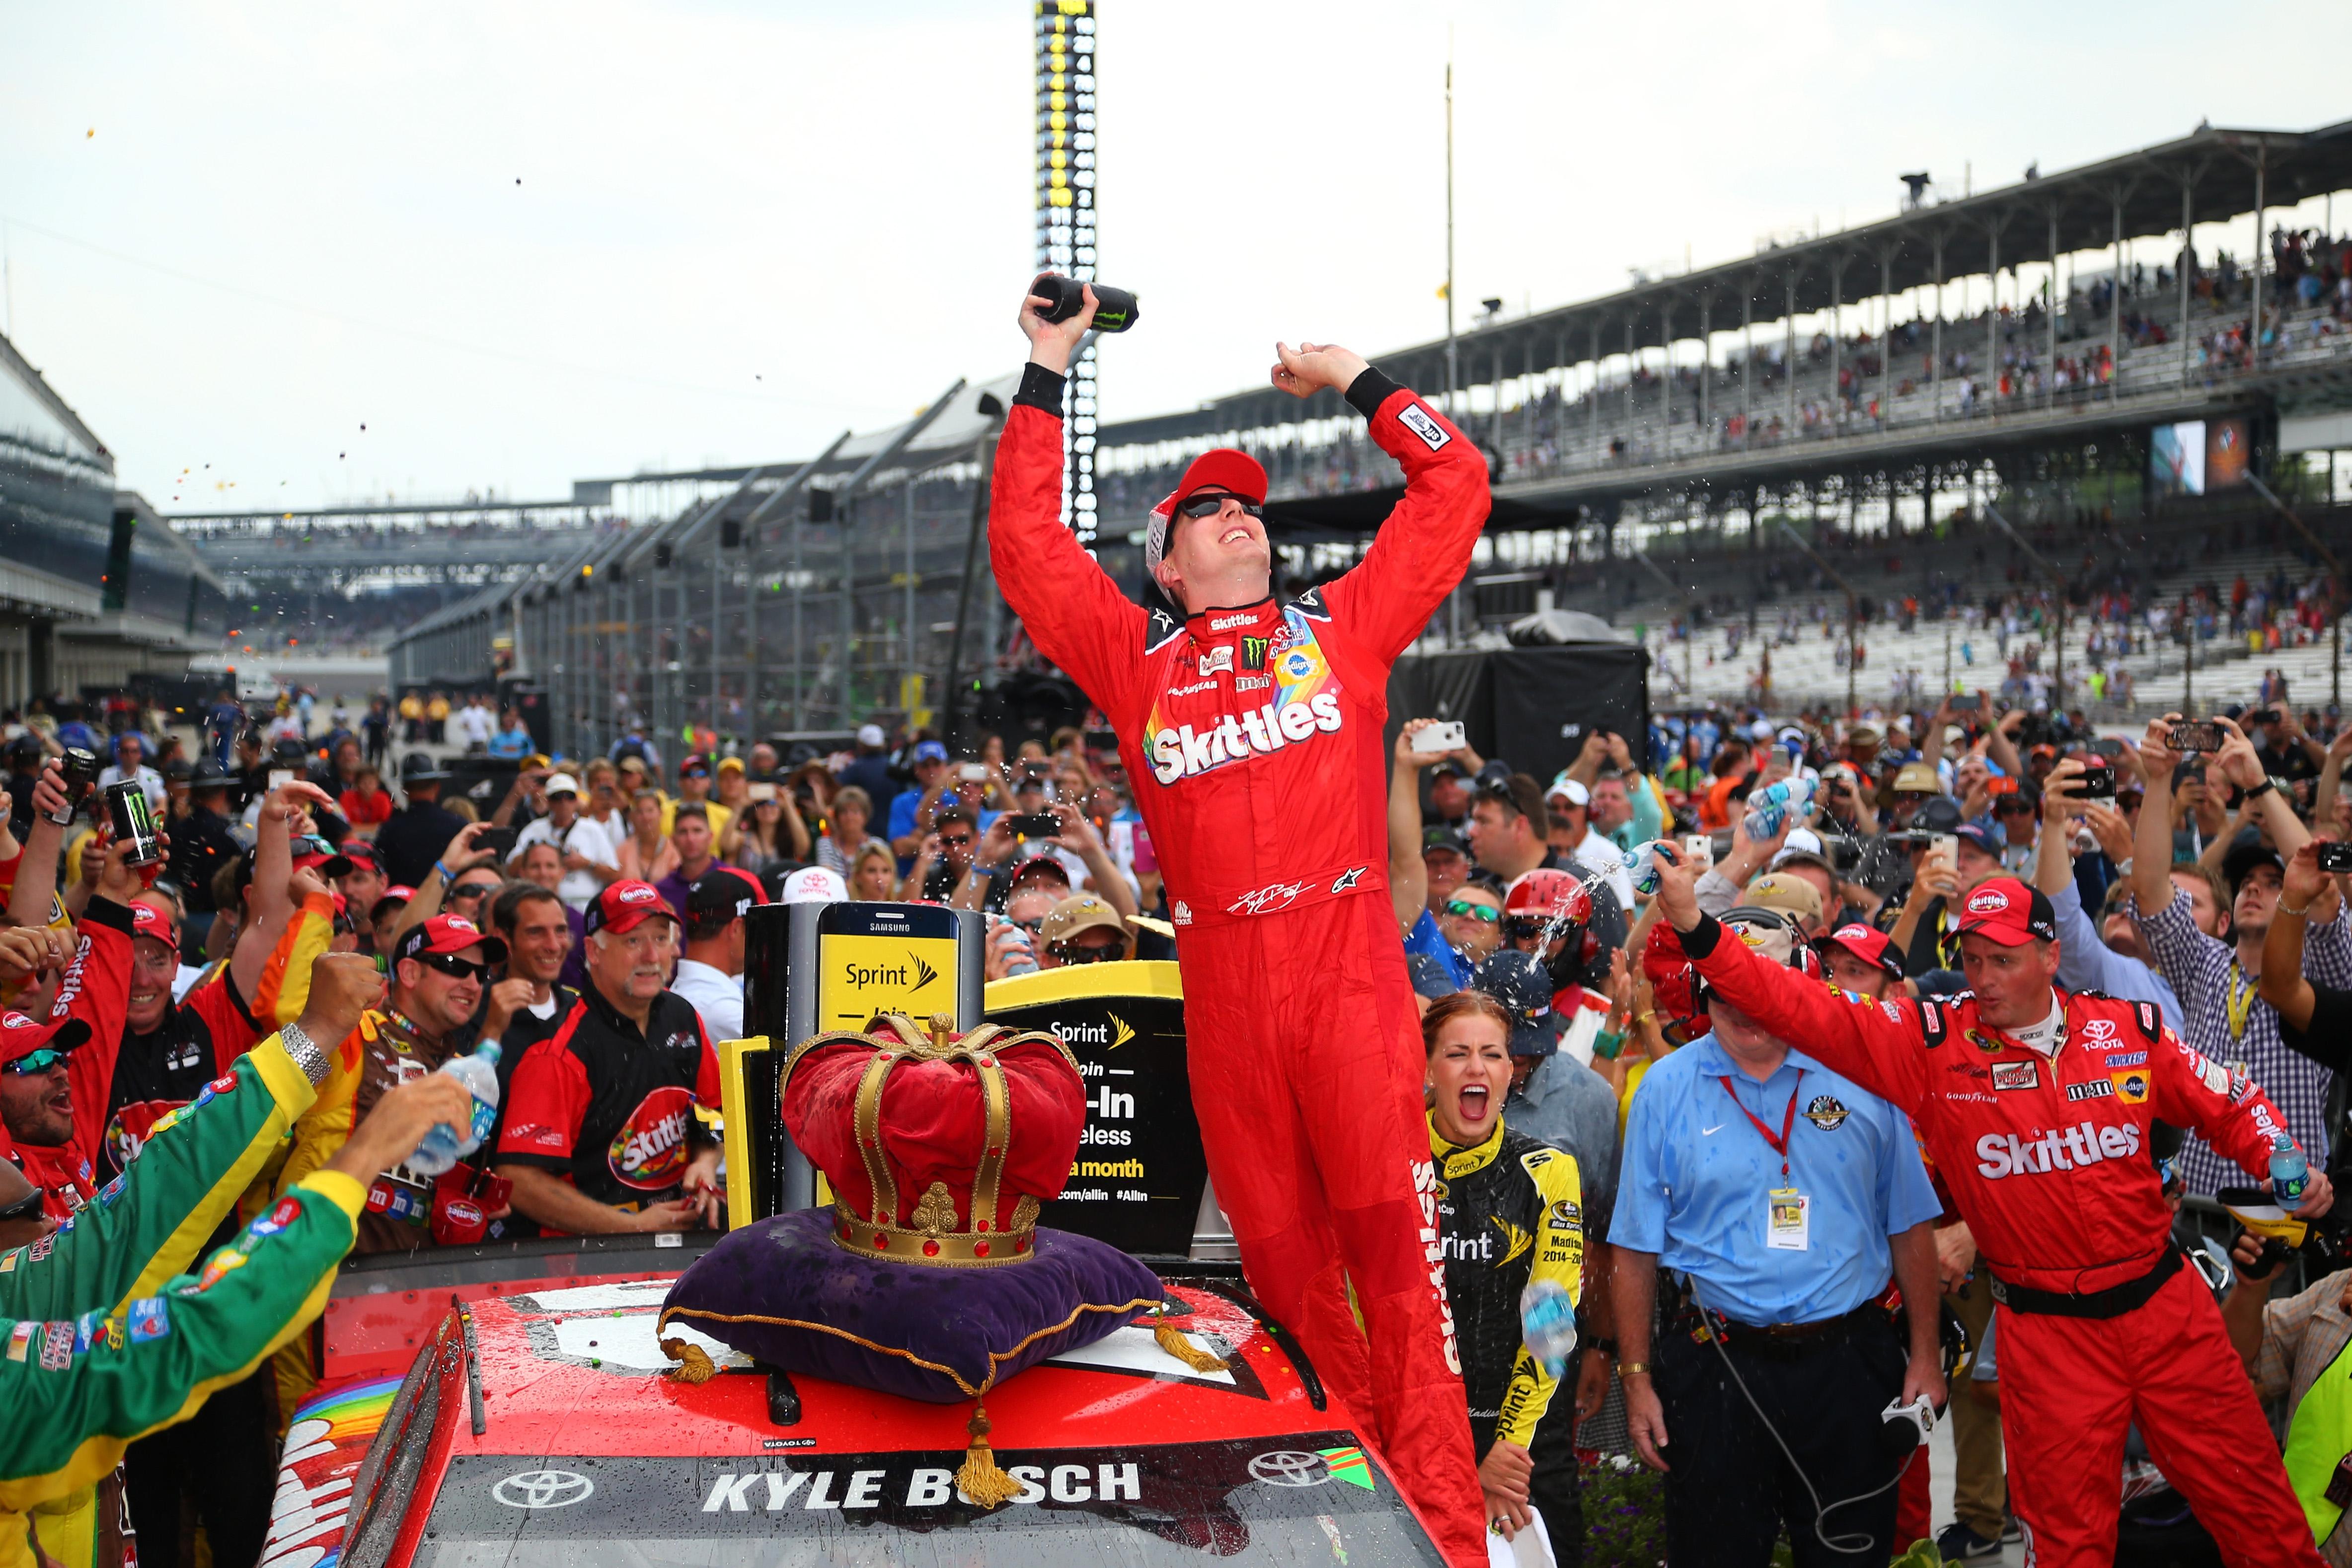 Kyle Busch celebrates winning the 2015 Brickyard 400 at Indianapolis Motor Speedway.